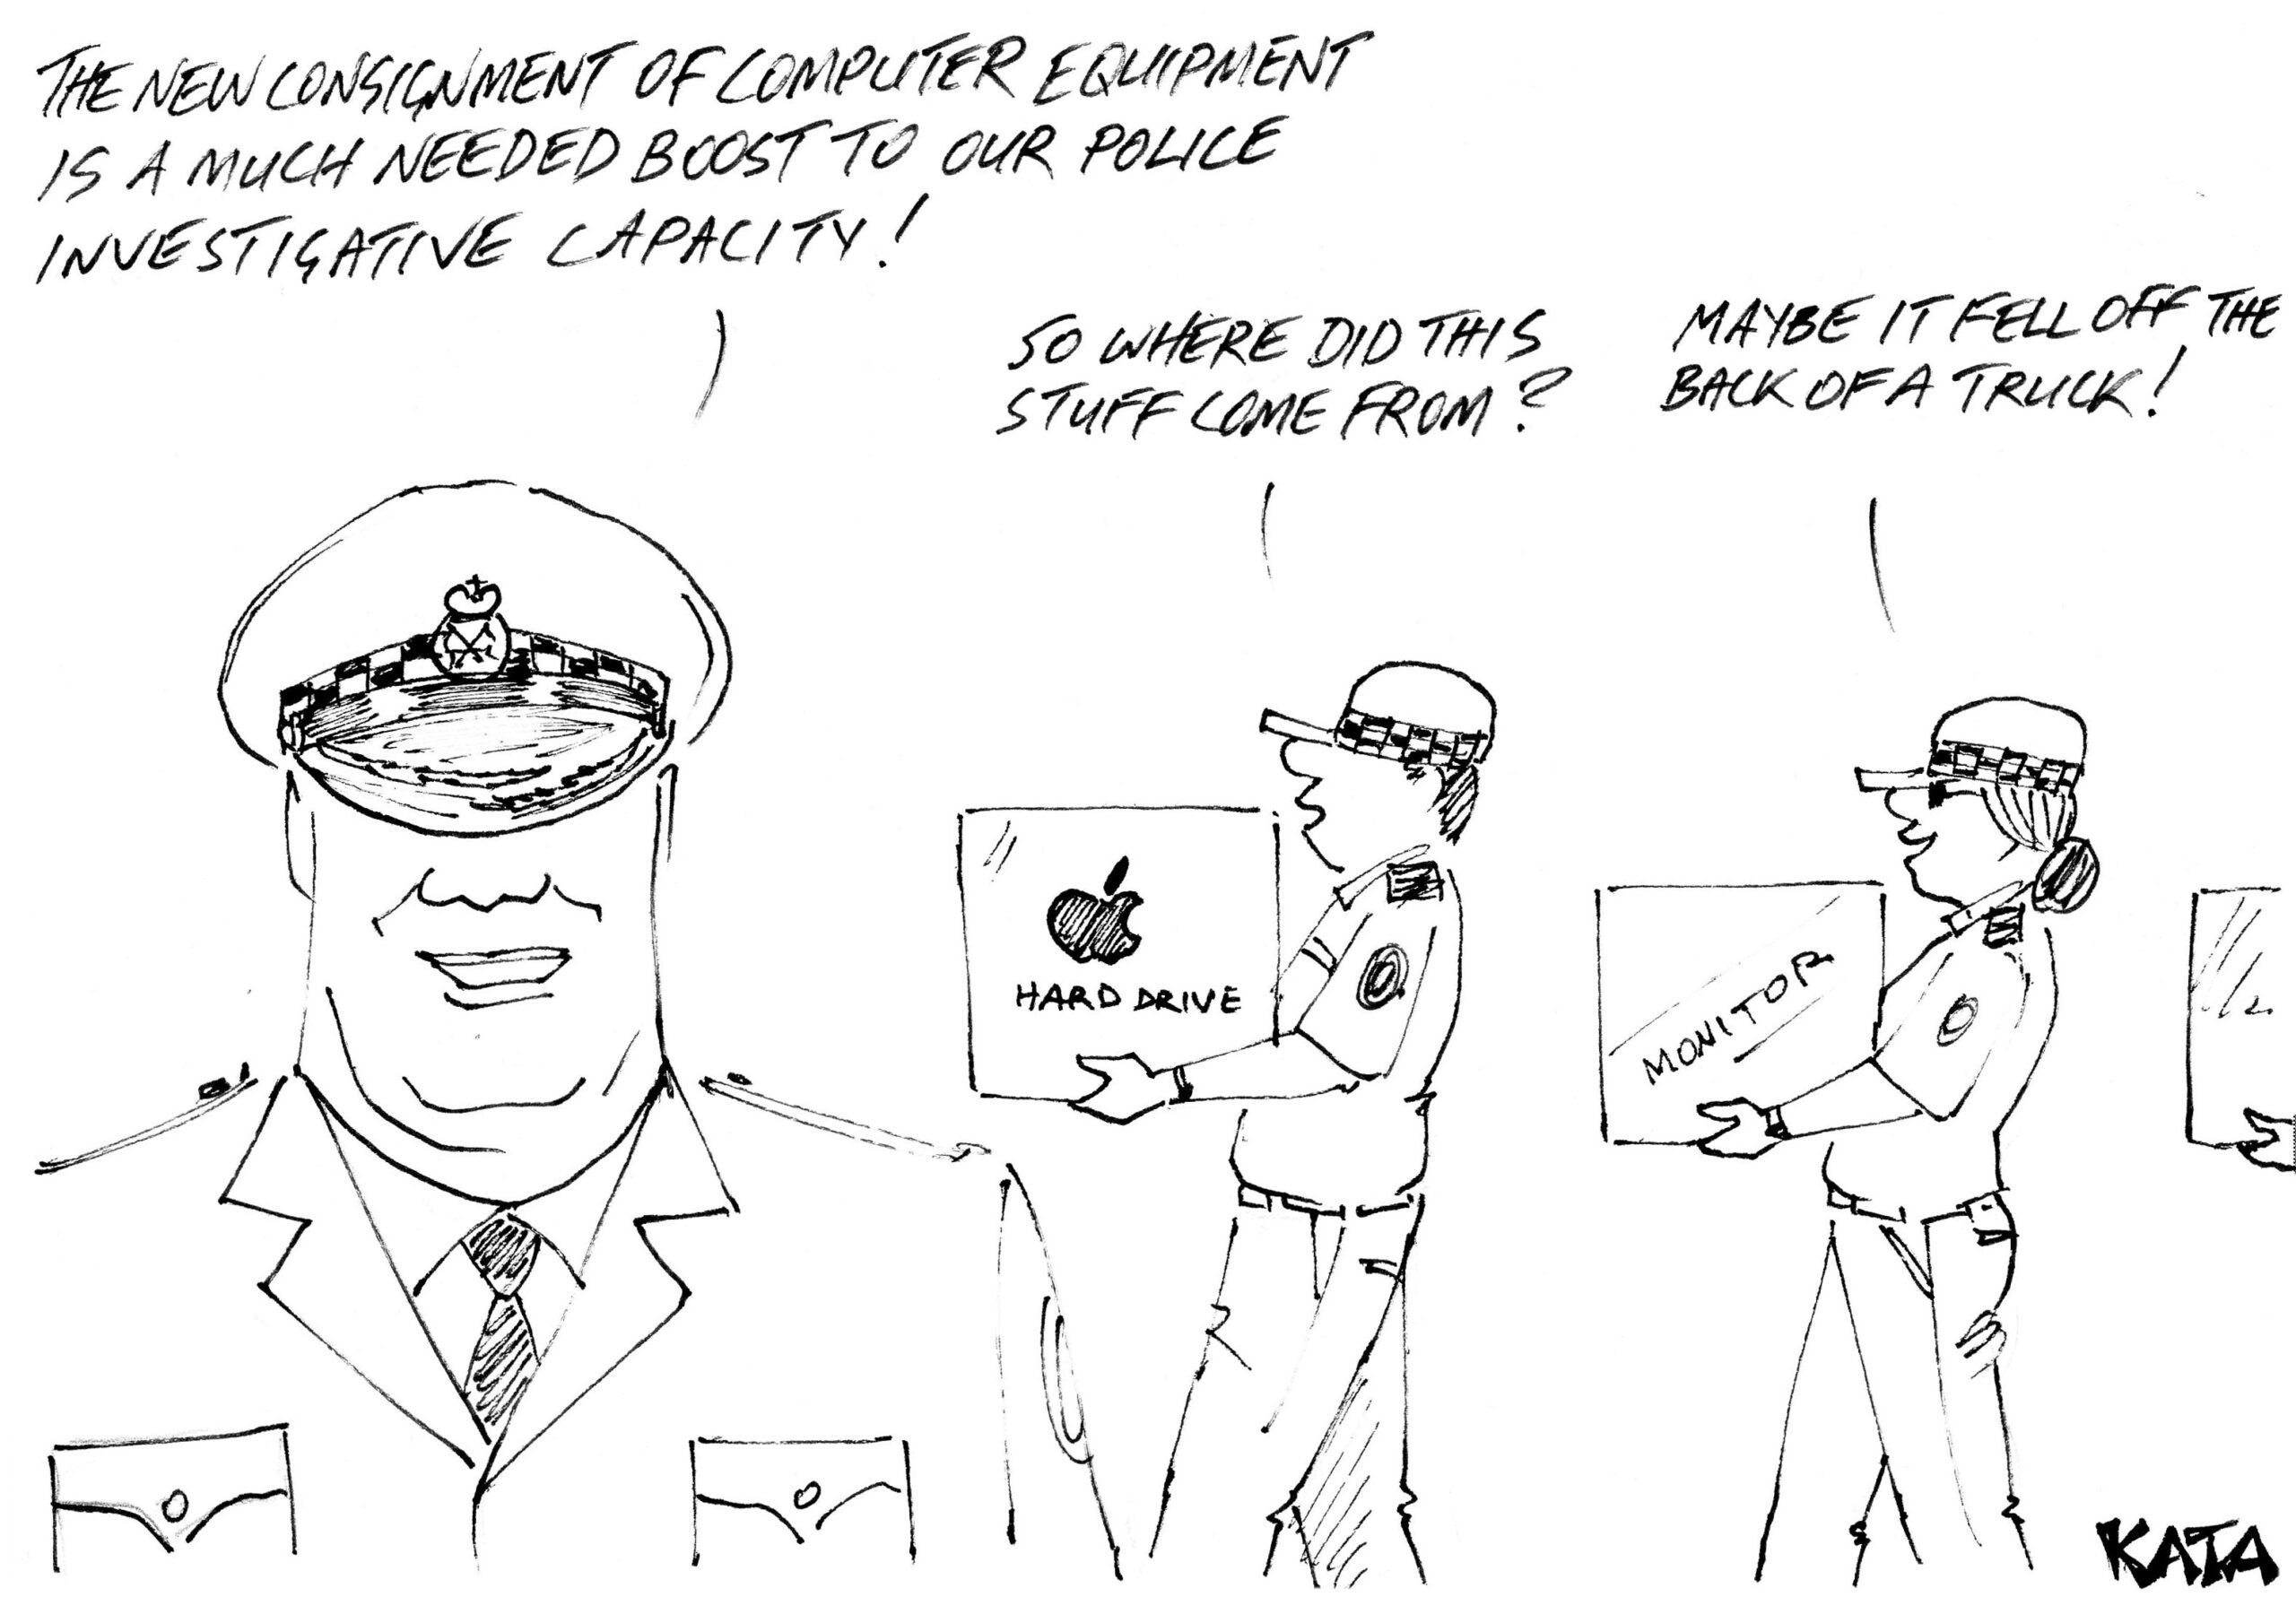 KATA: Computer gear for police